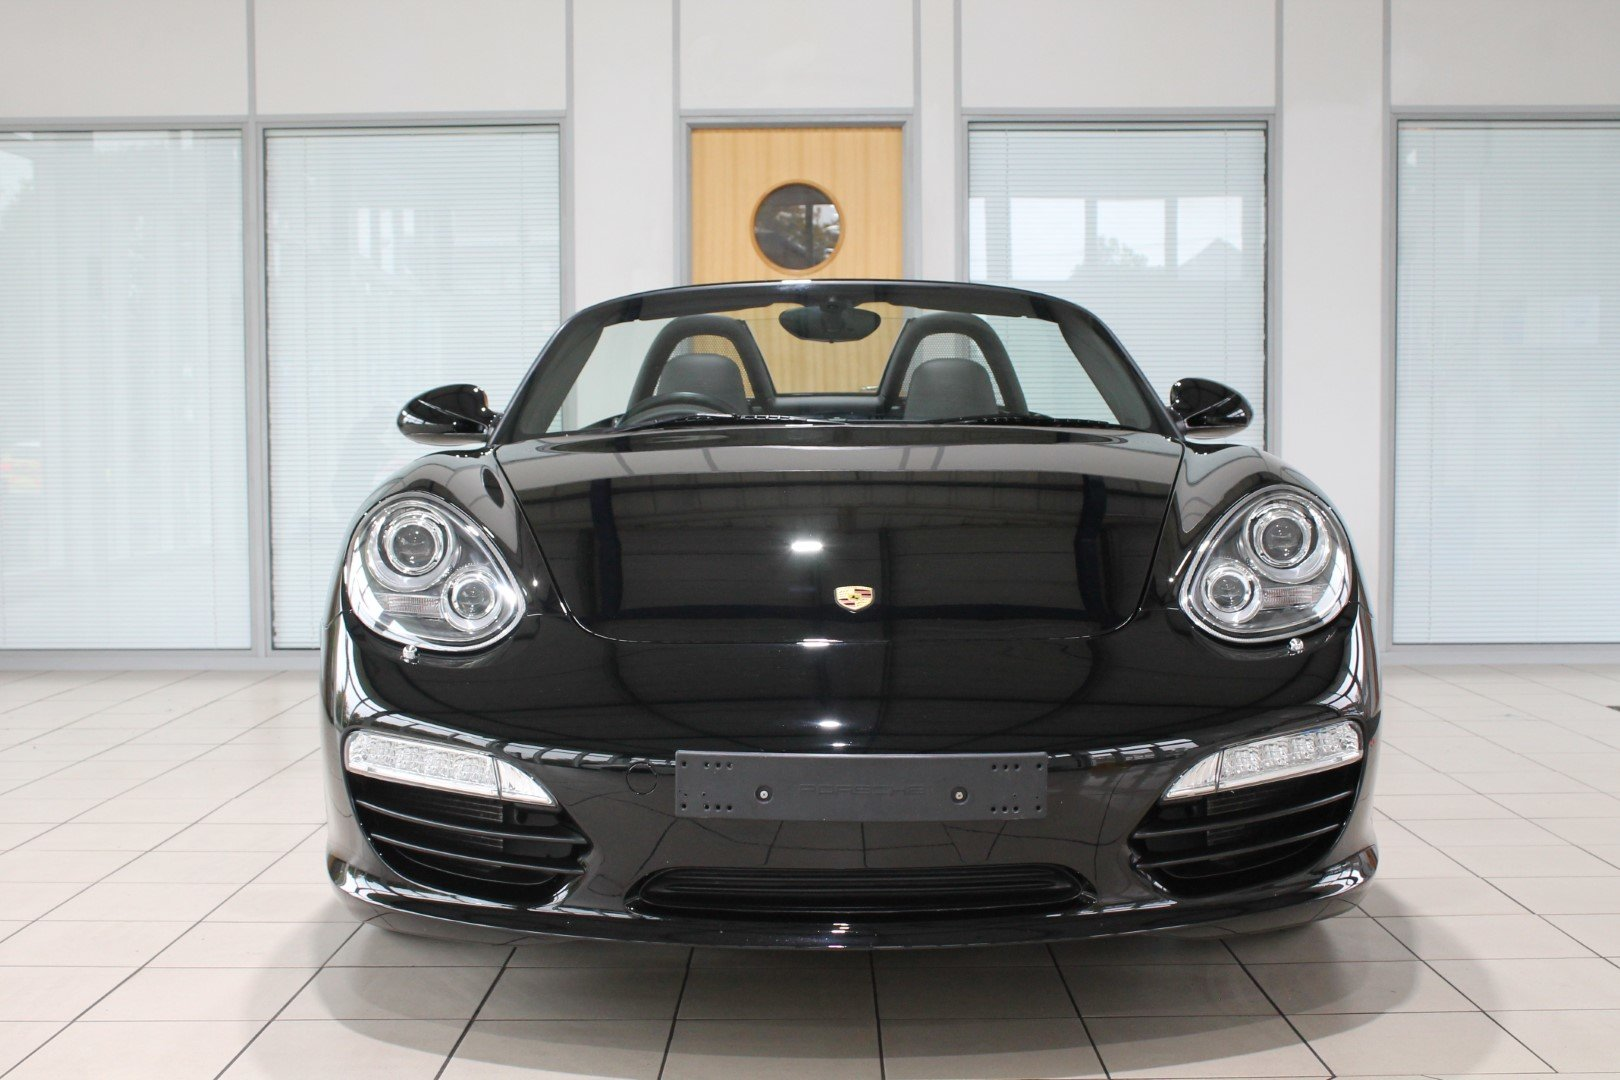 2011 Porsche Boxster (987) 3.4 S Black Edition Manual For Sale (picture 7 of 12)